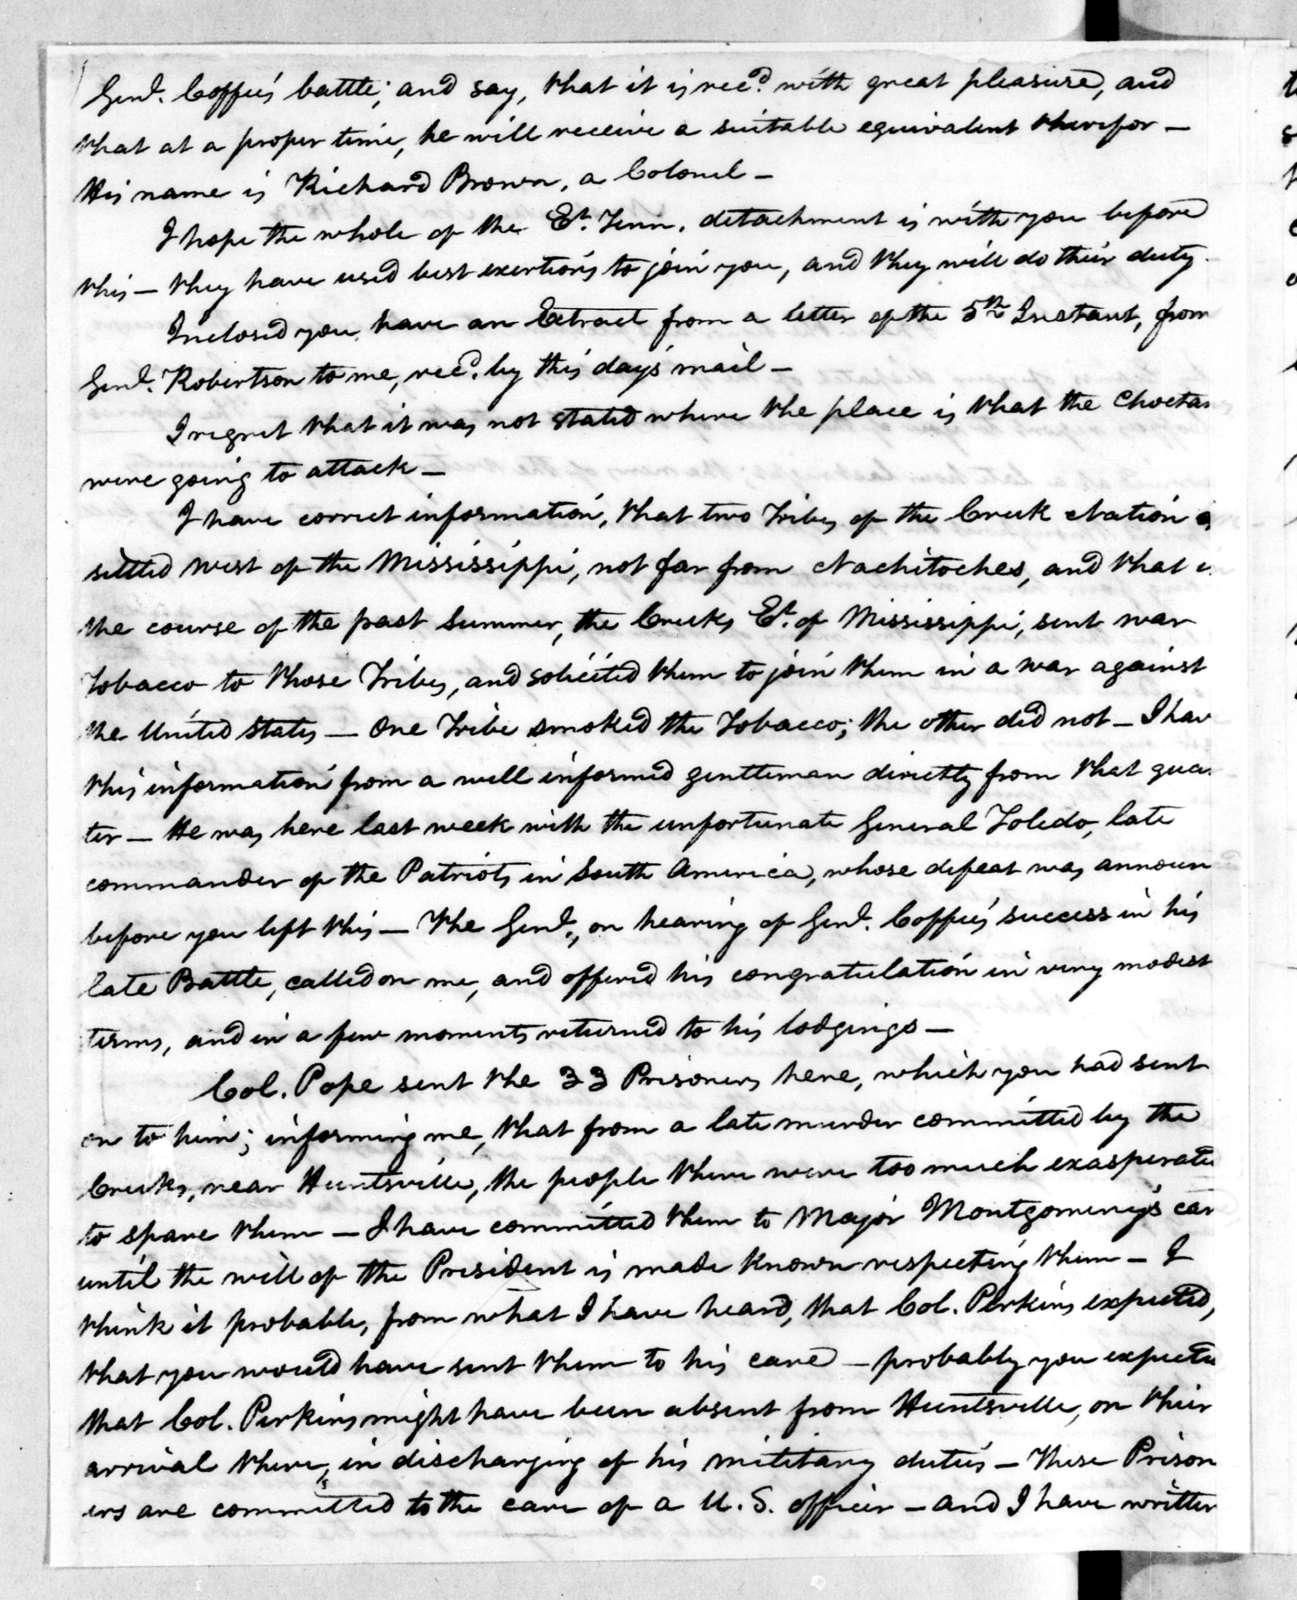 Willie Blount to Andrew Jackson, November 9, 1813